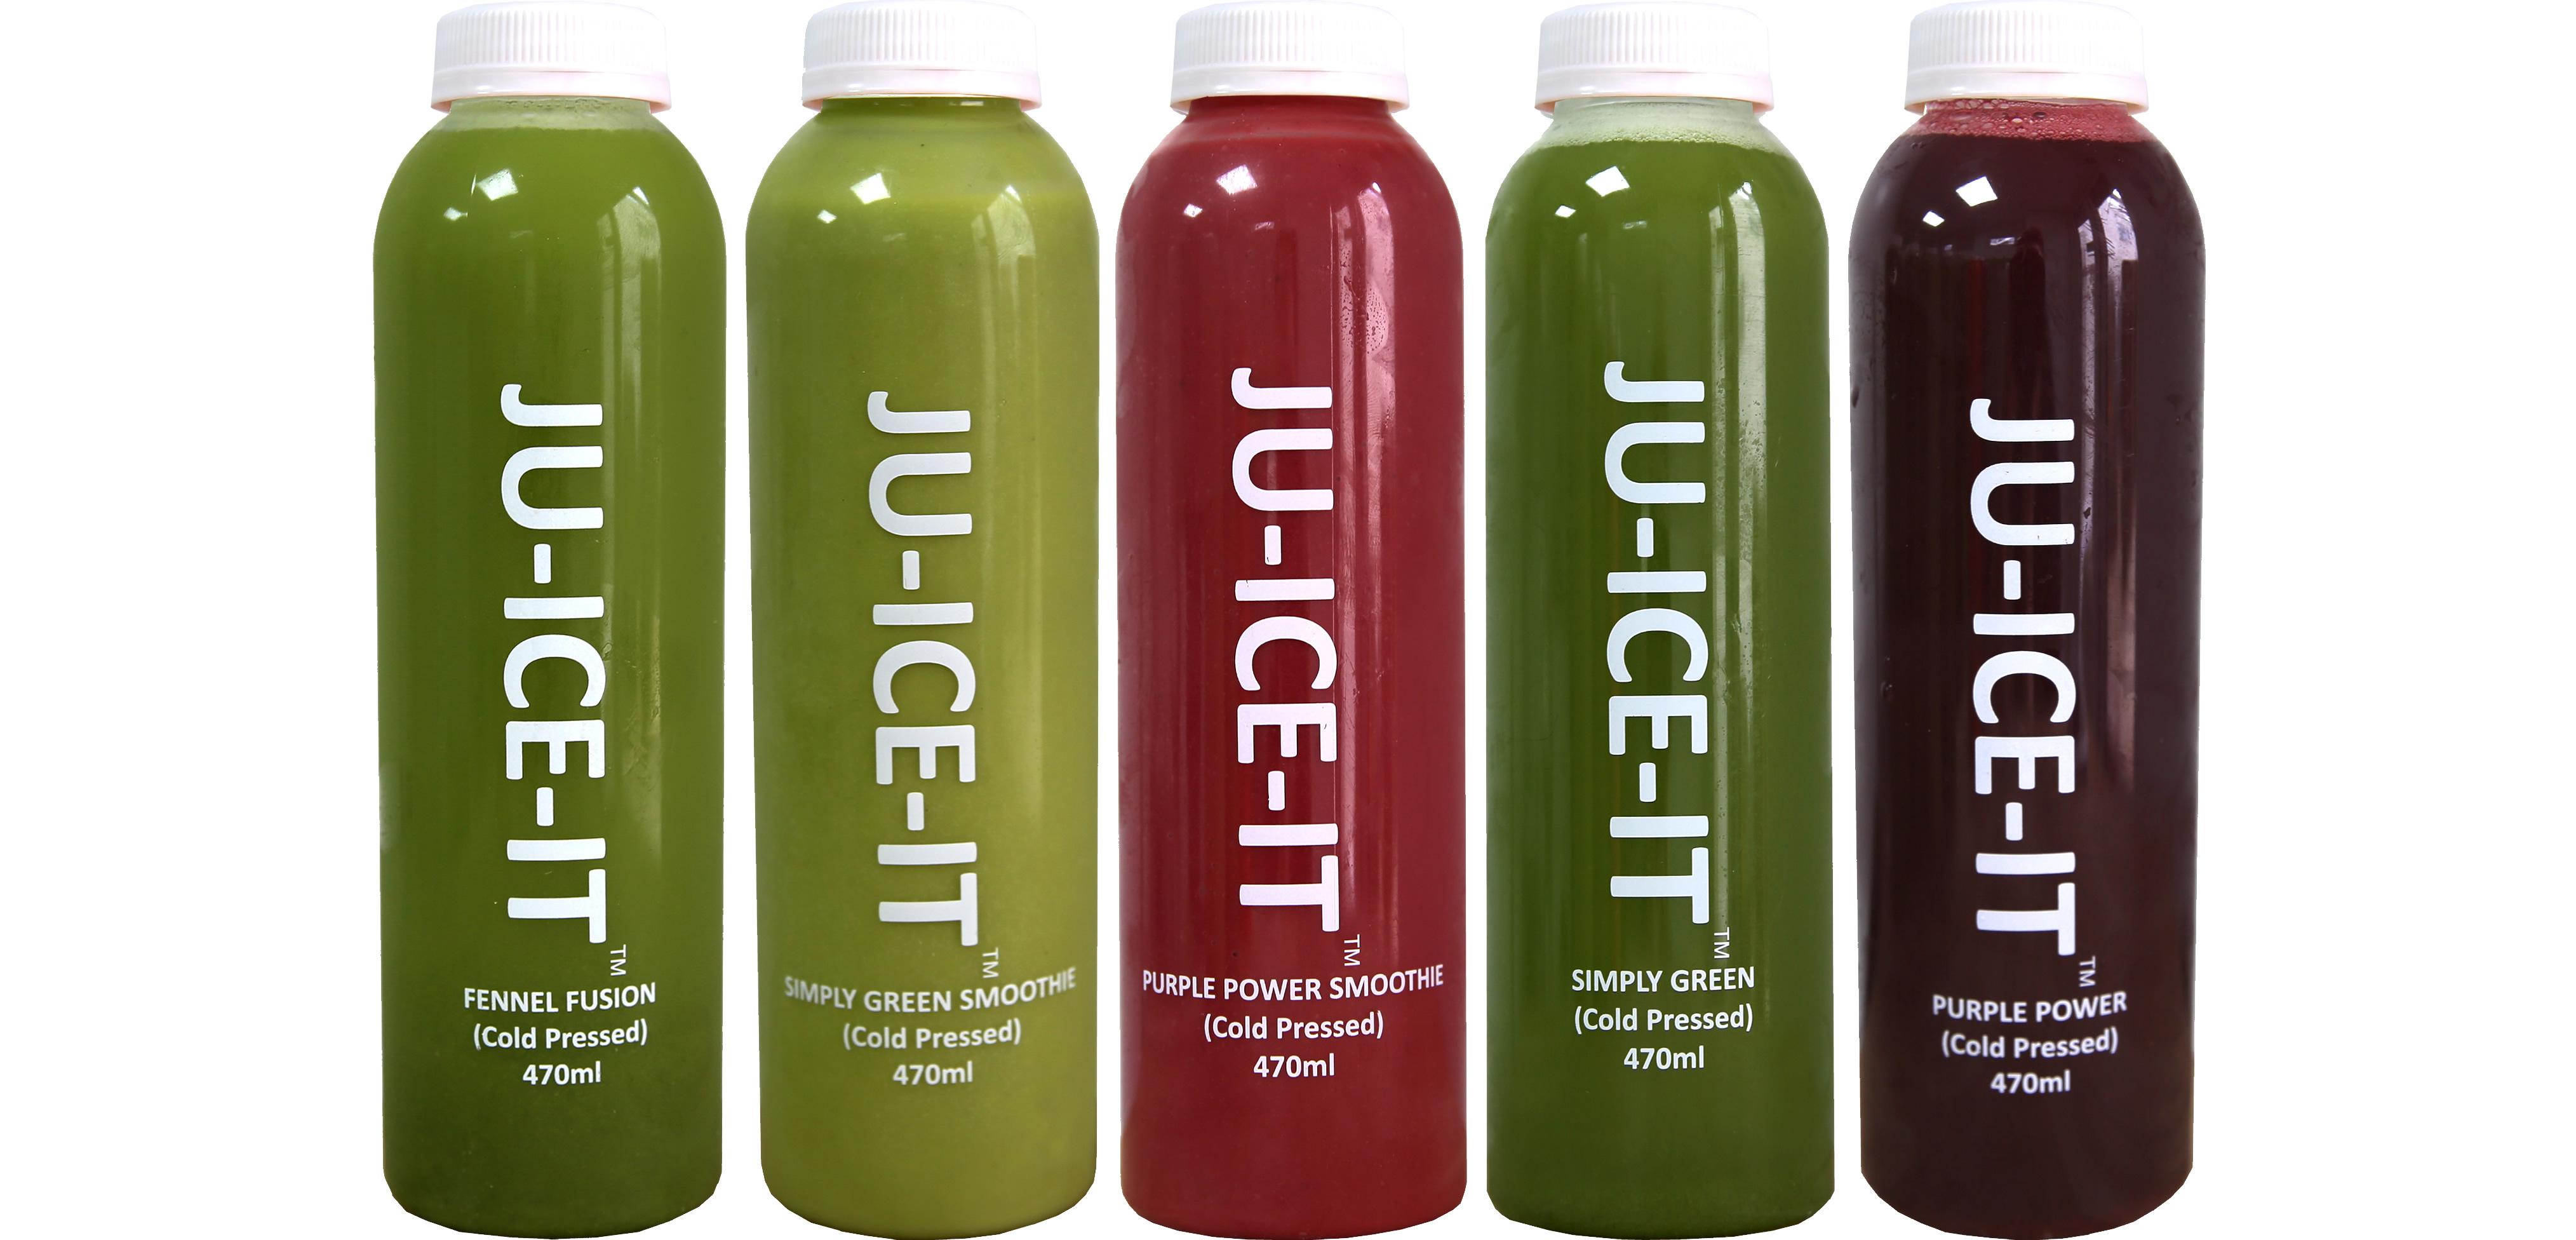 5 juices